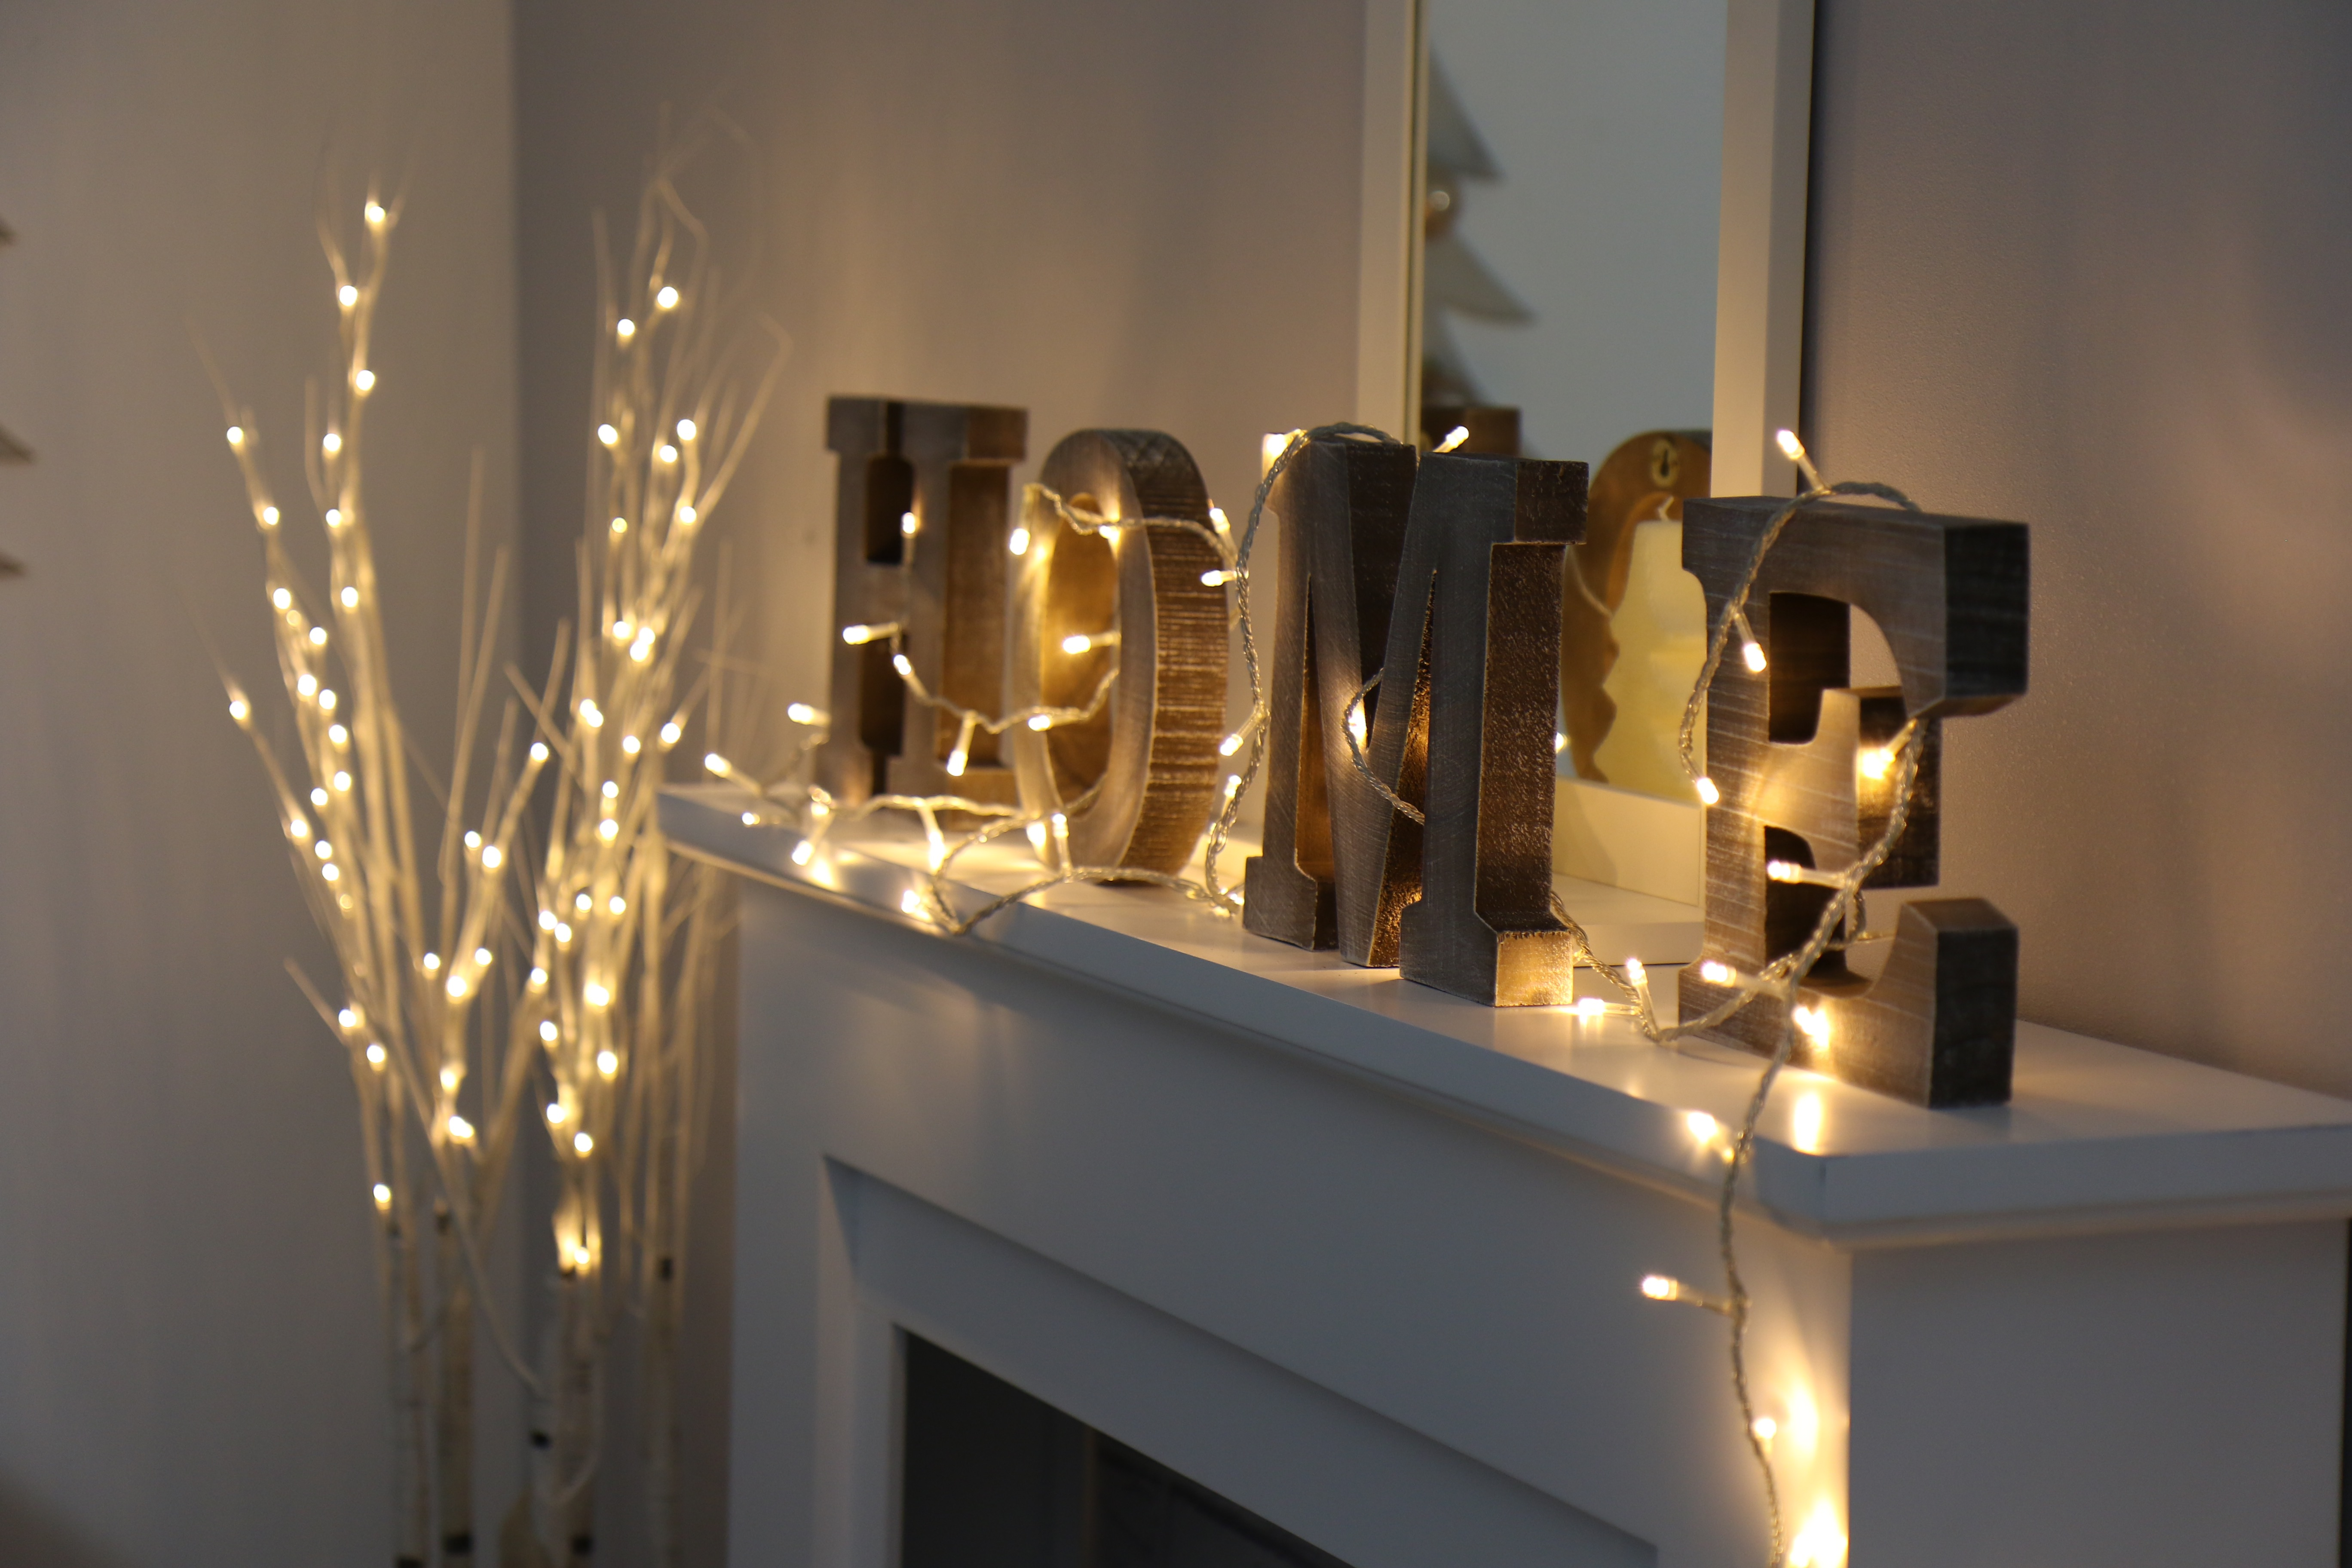 Deco noel maison lumineuse